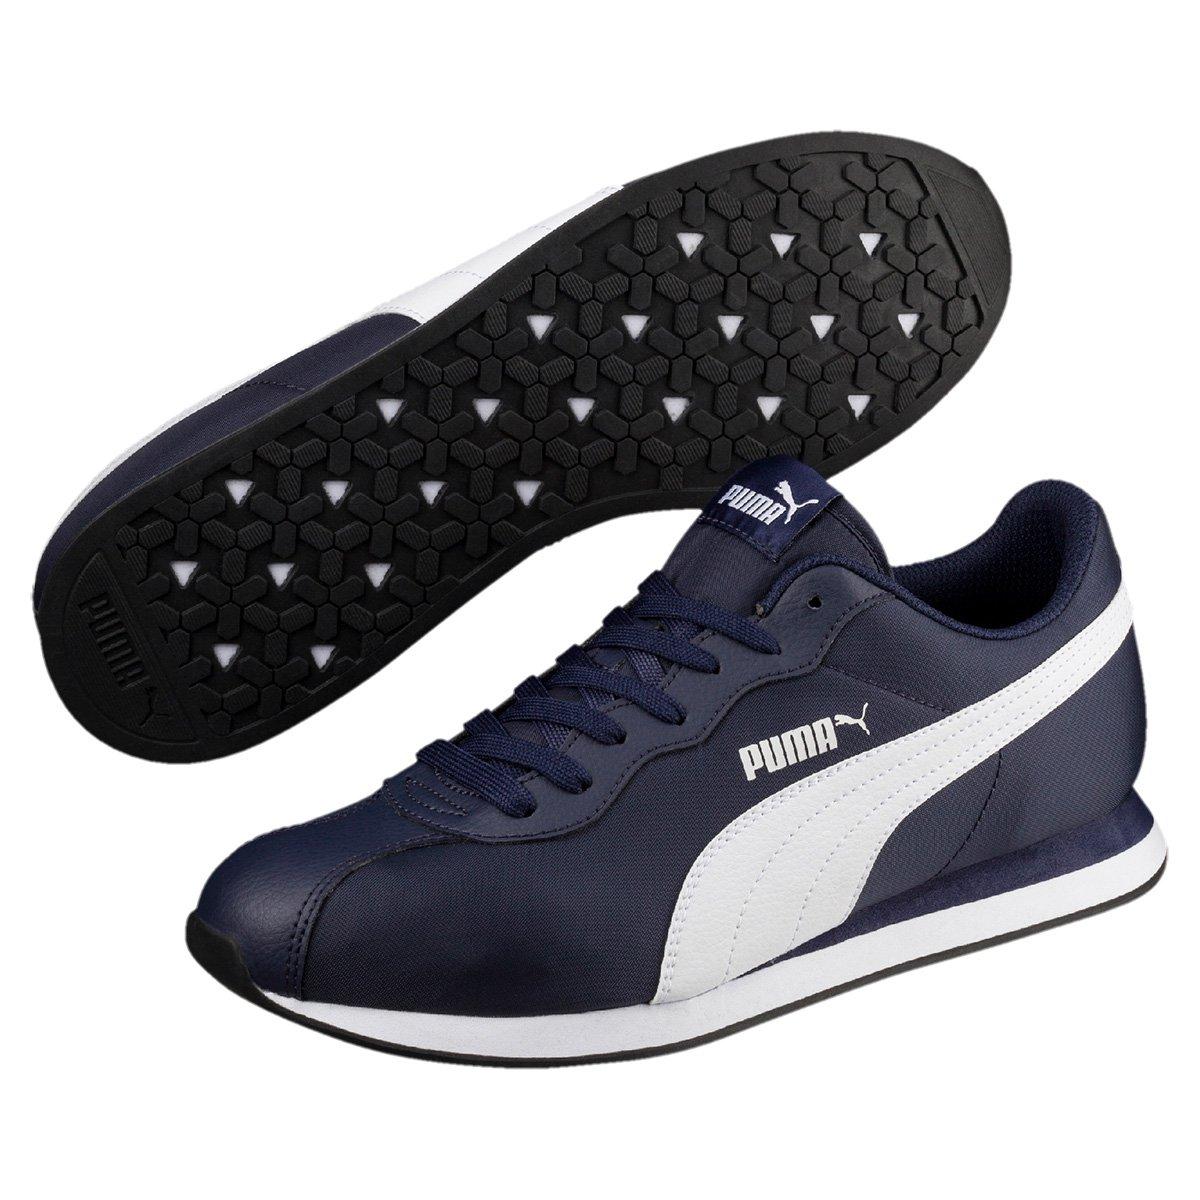 dbf52ef1b8281 FornecedorNetshoes. Tênis Puma Turin II NL